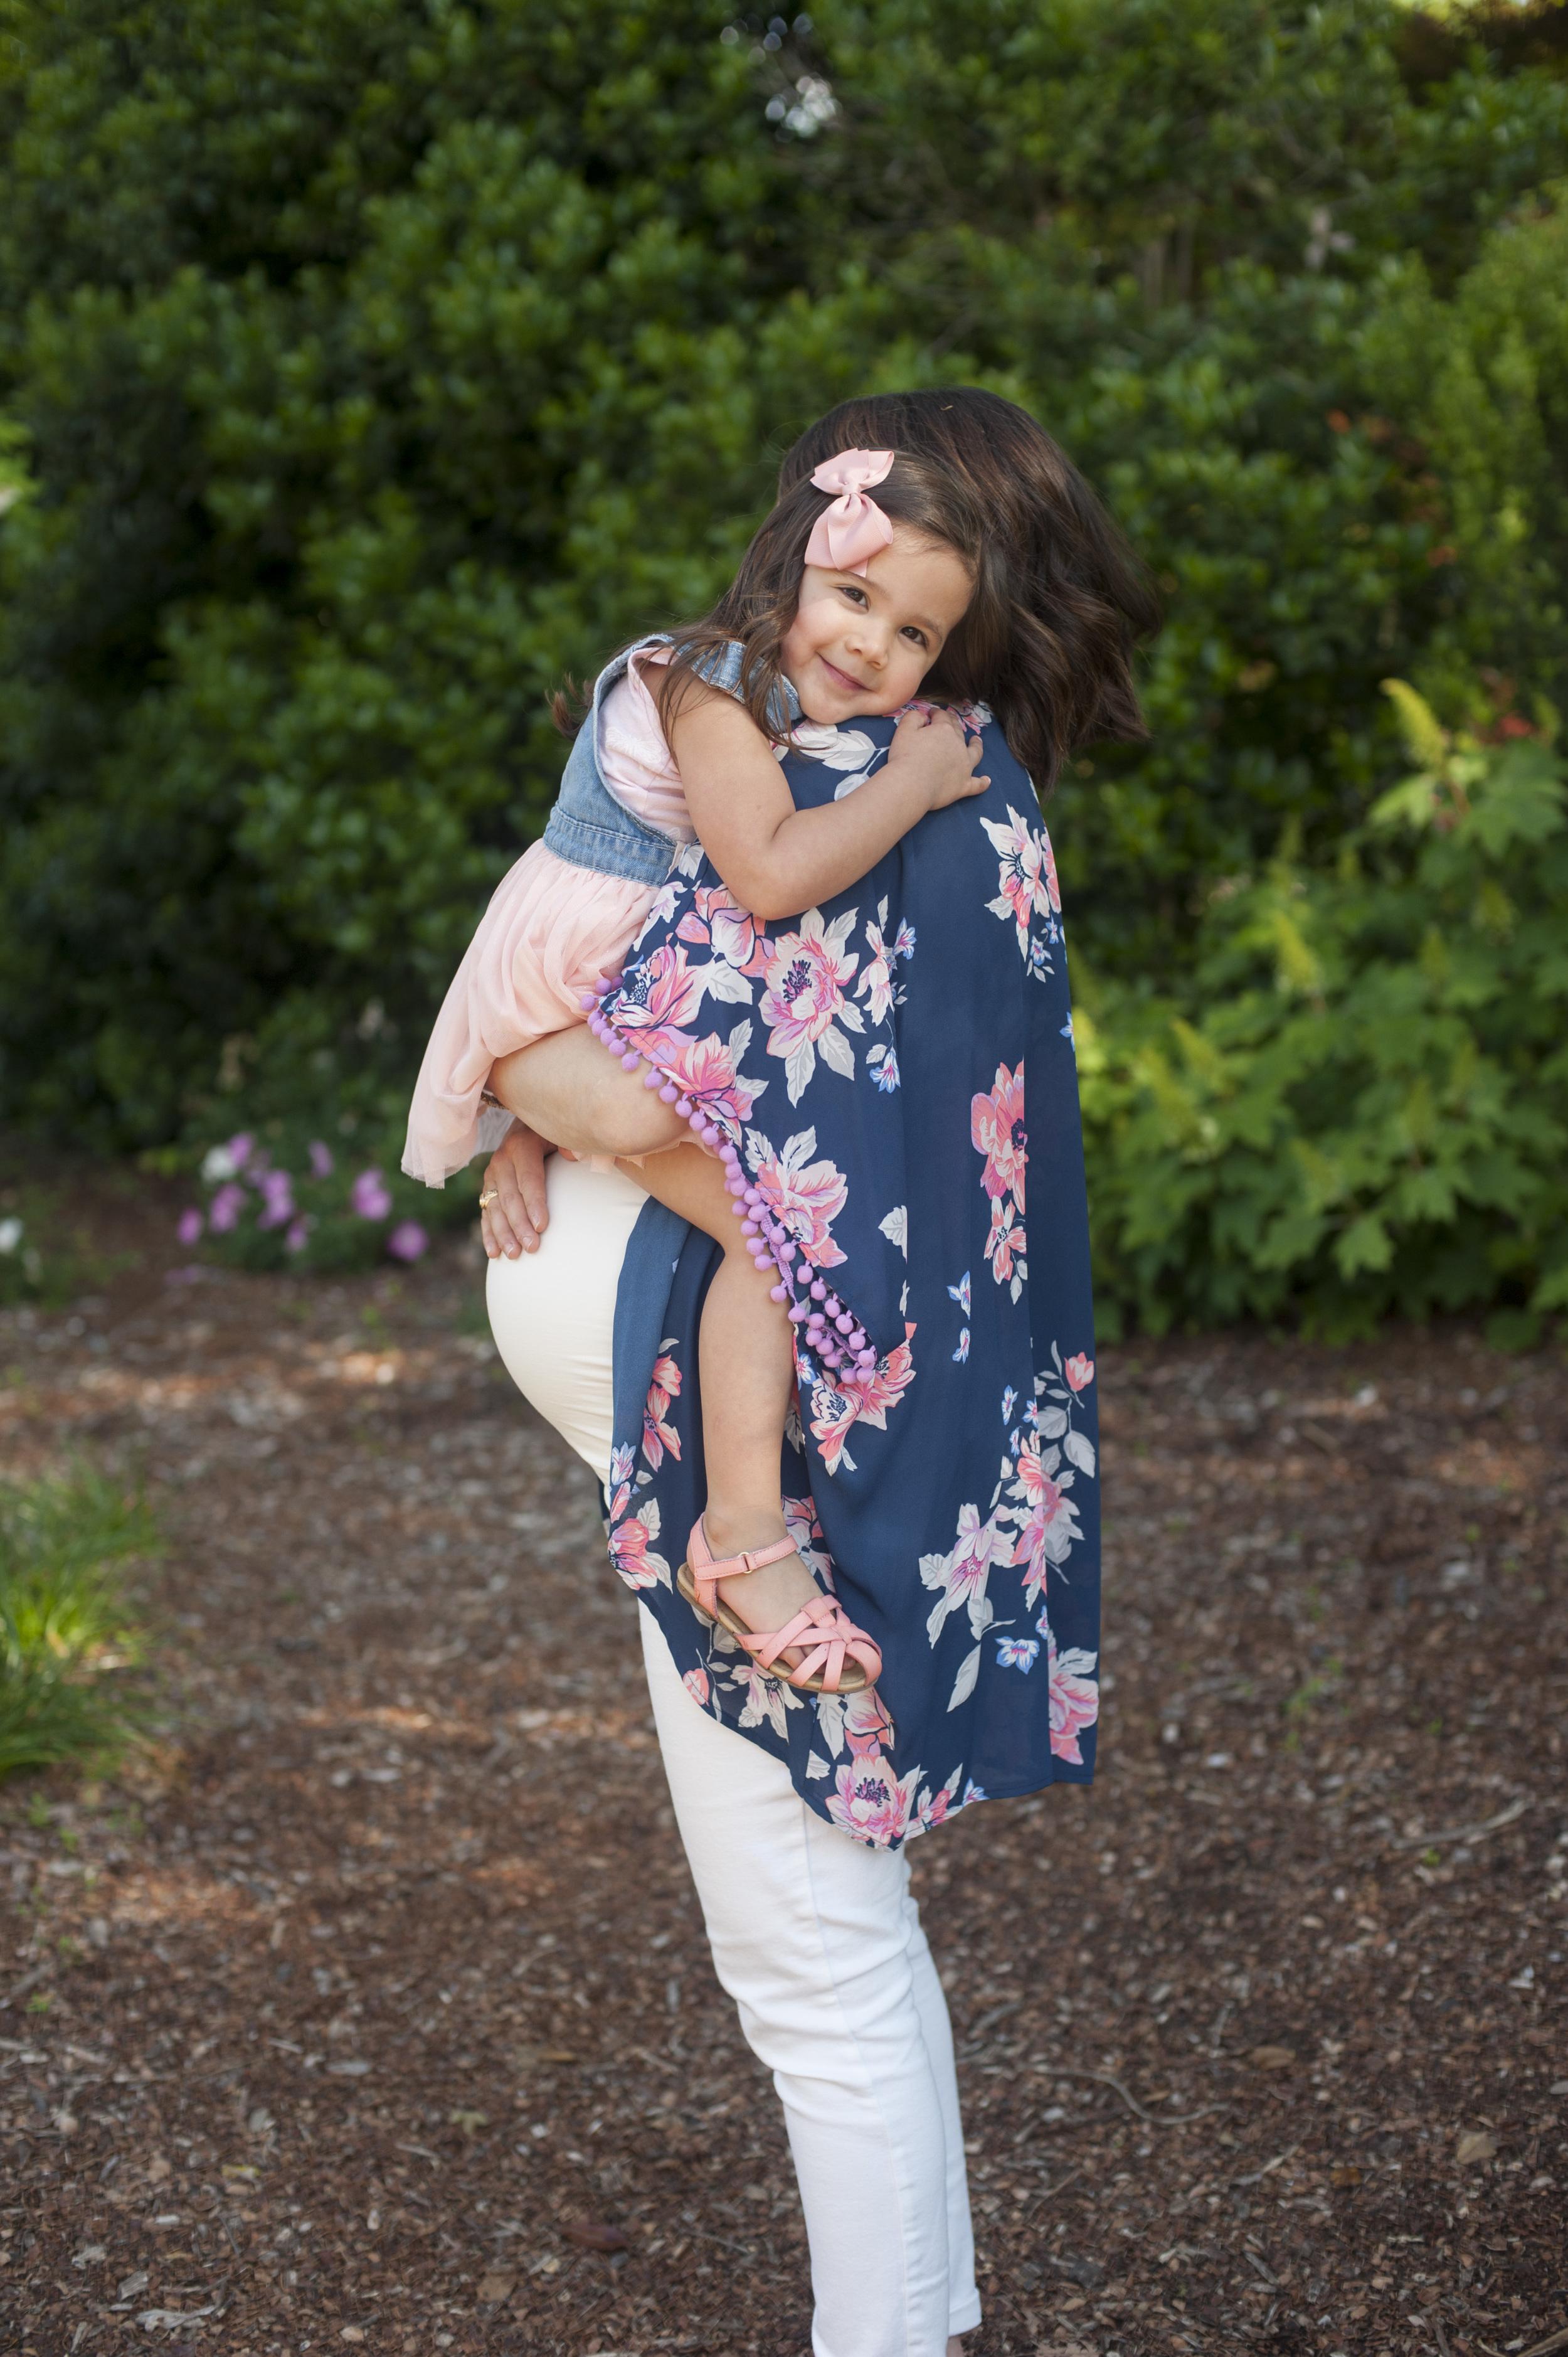 Big sister cuddling mom. Maternity photo at the Dallas Arboretum.